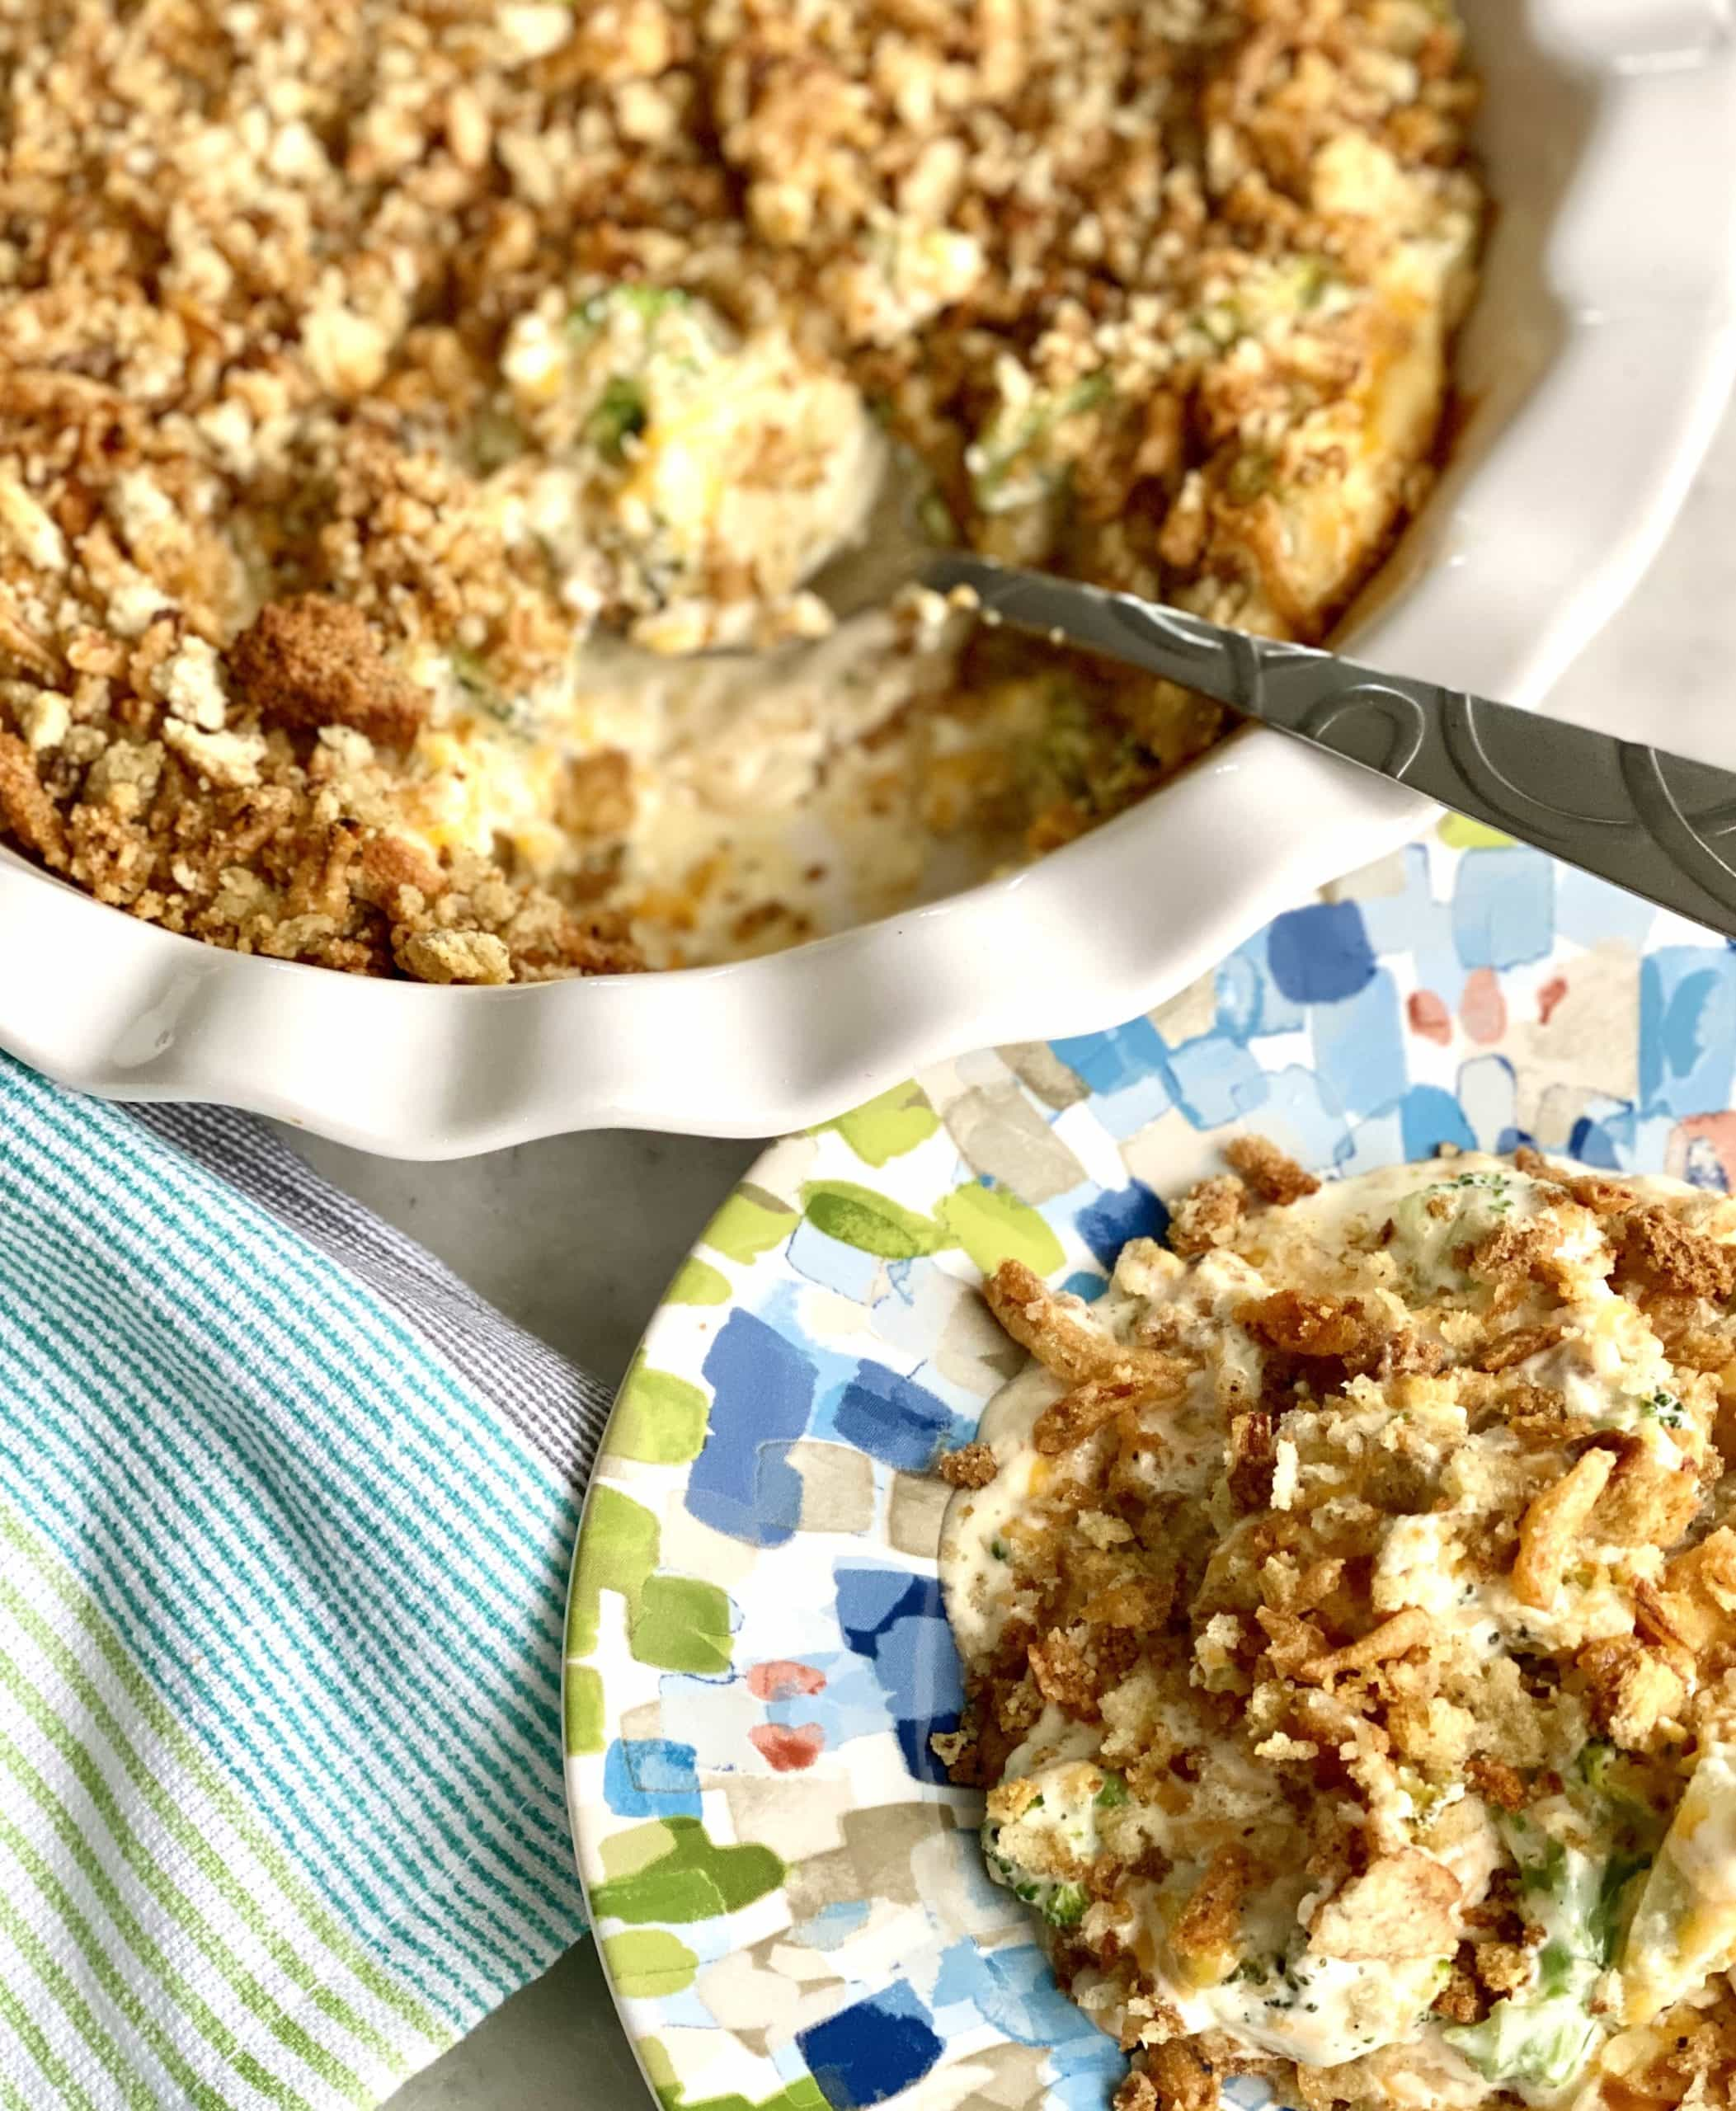 broccoli cheese casserole in a multi colored dish with a spoon